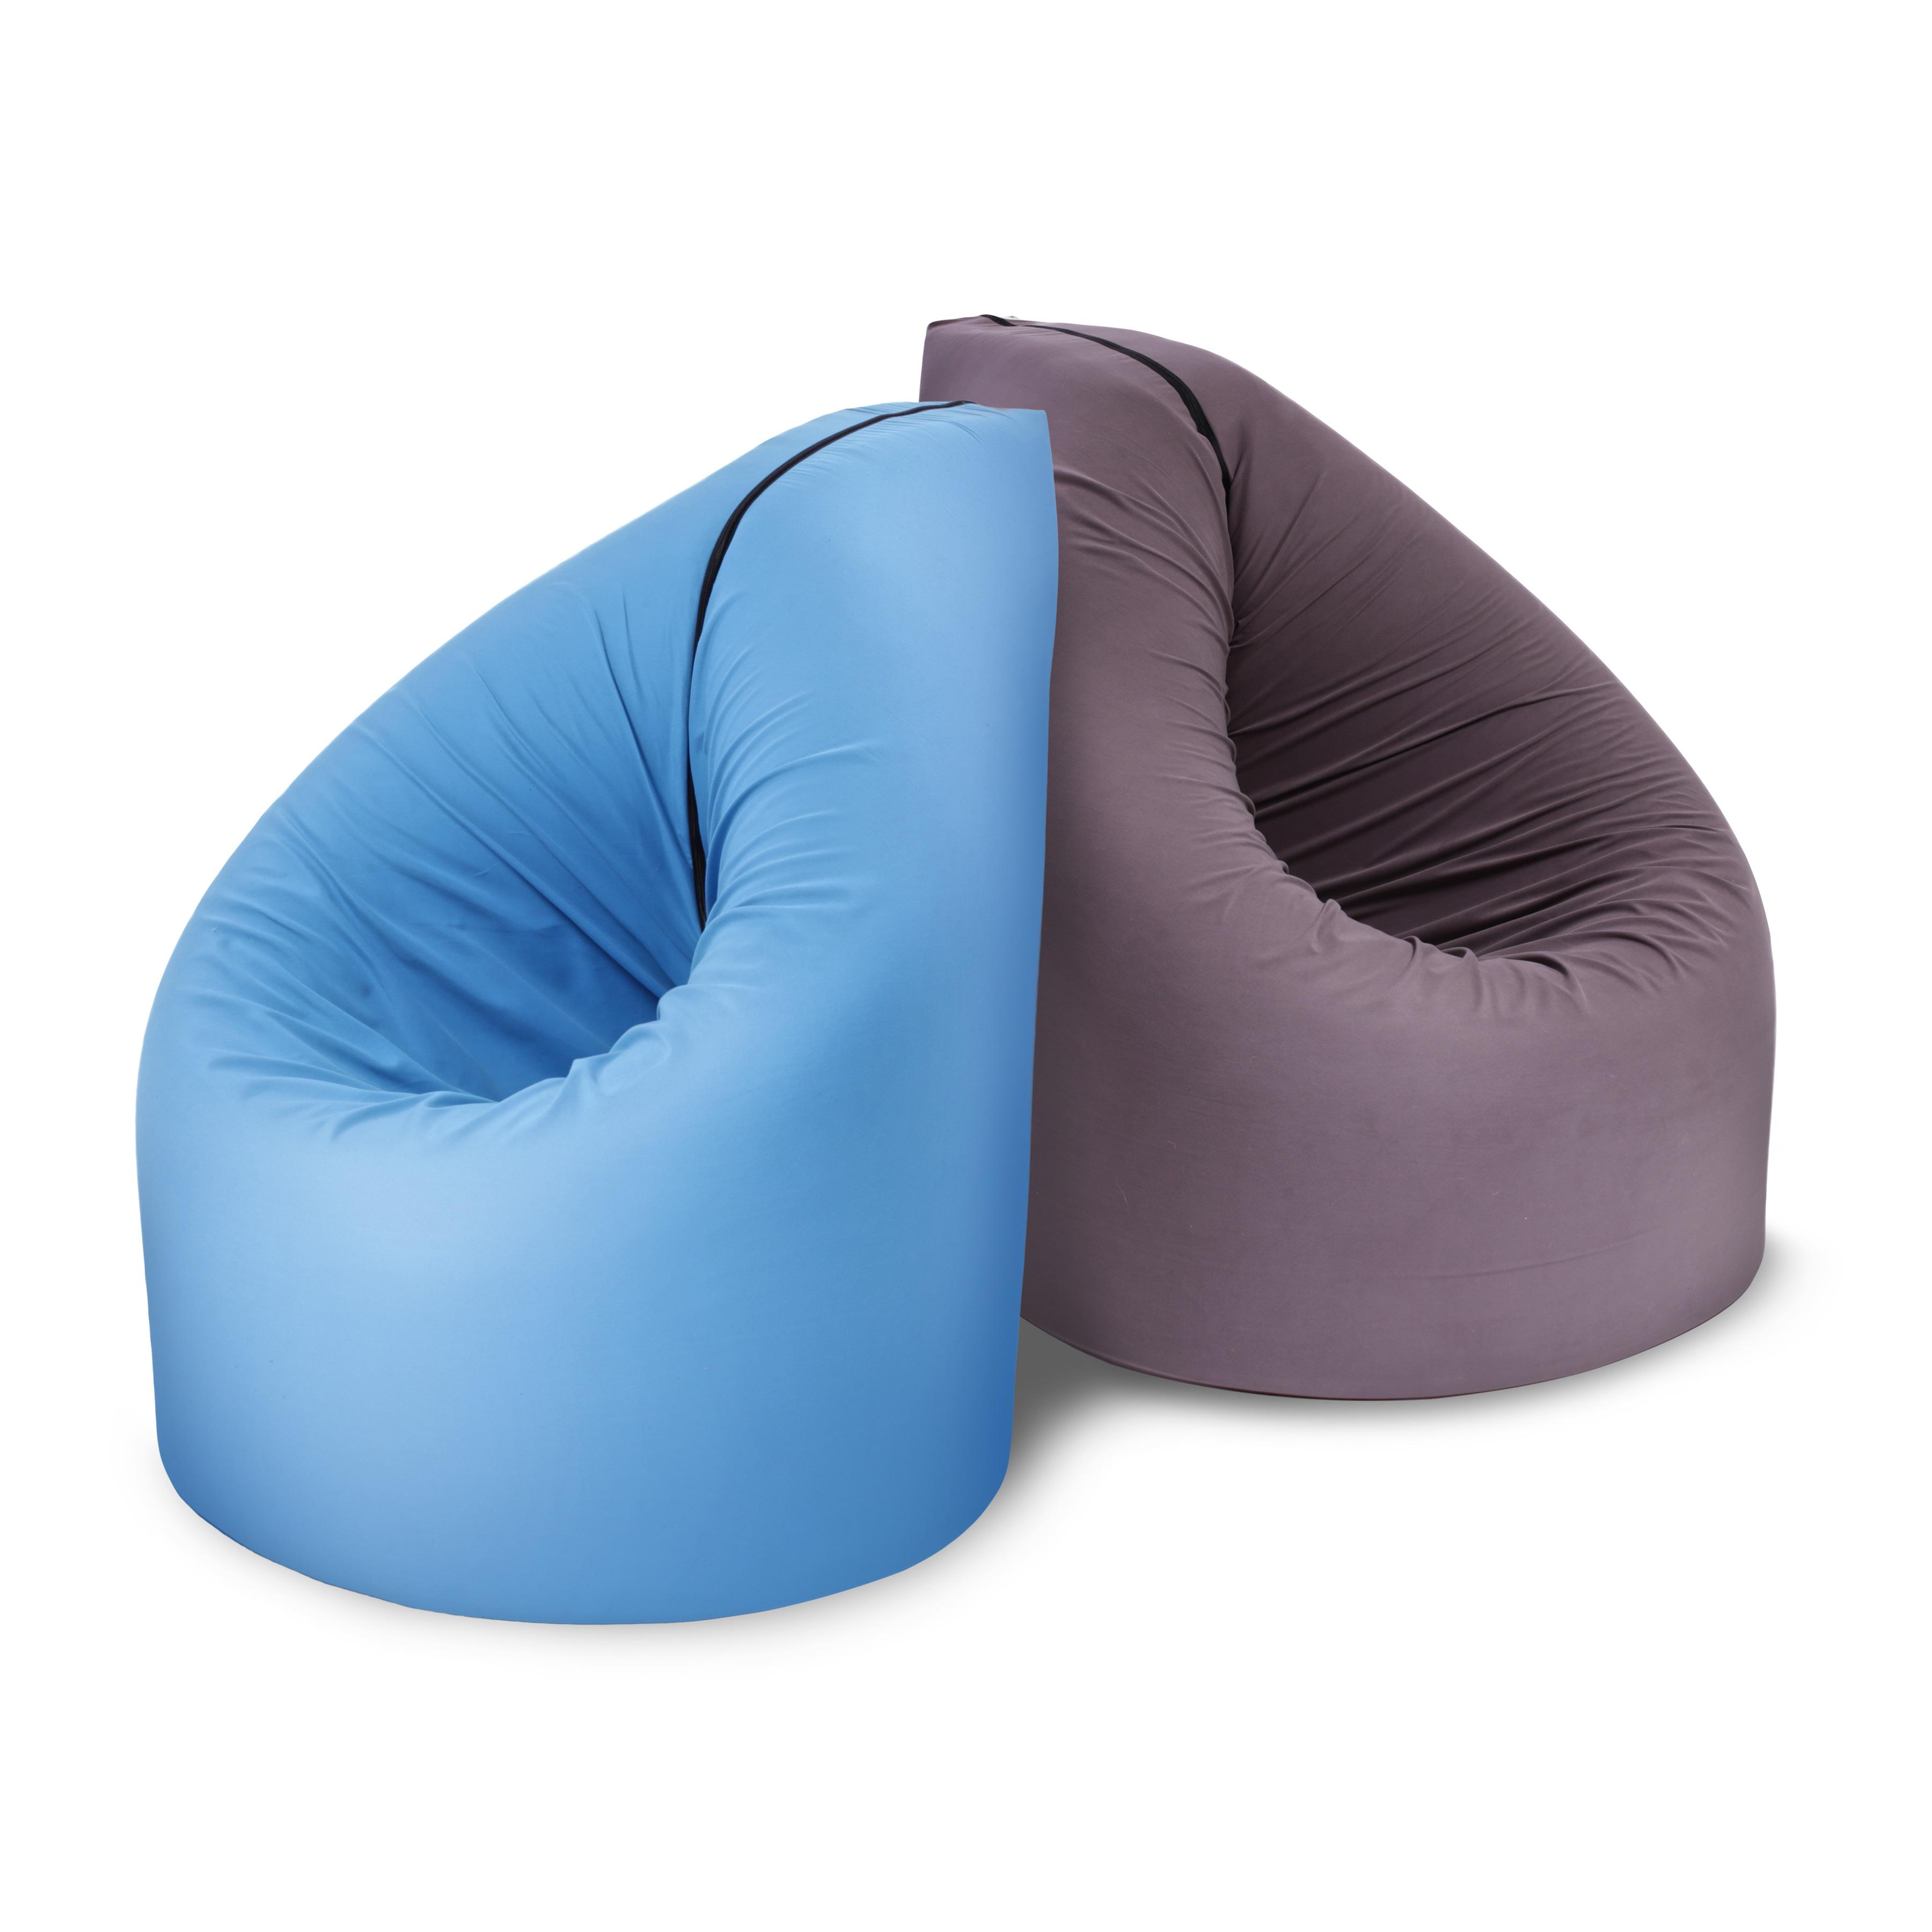 Almila wandelbarer Pagbed Sitzsack in Blau